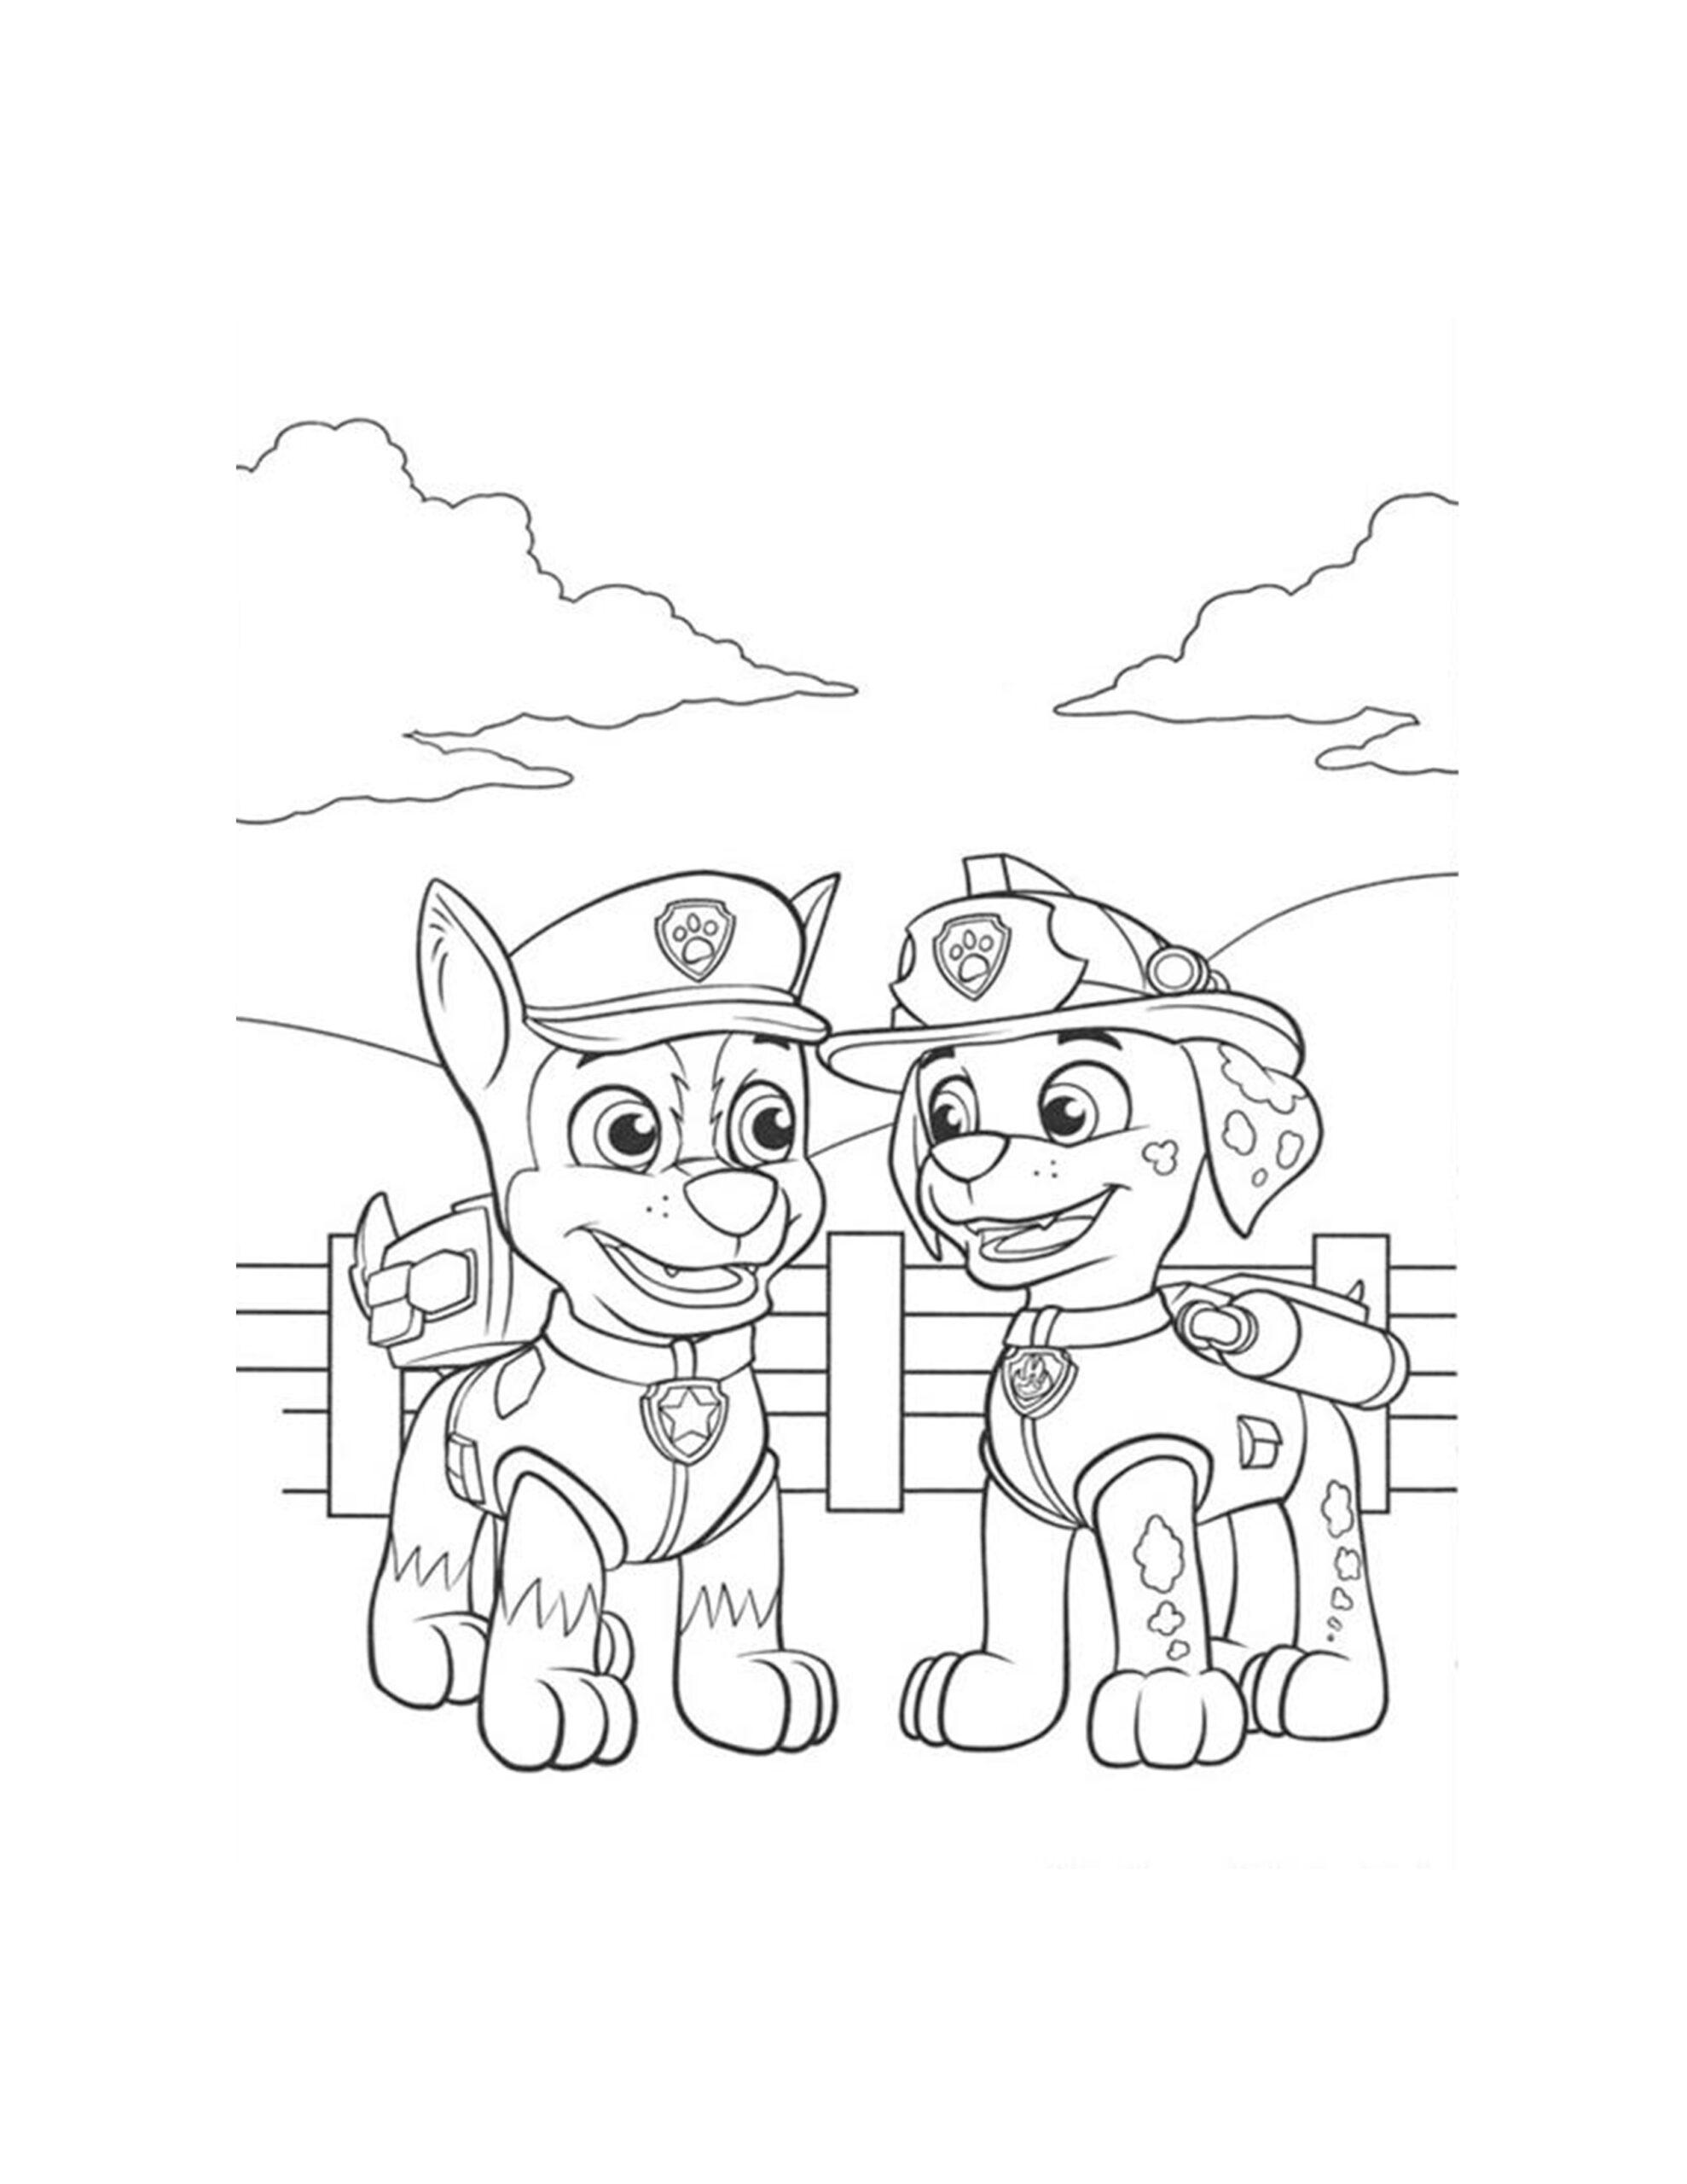 kleurplaat tekenen paw patrol